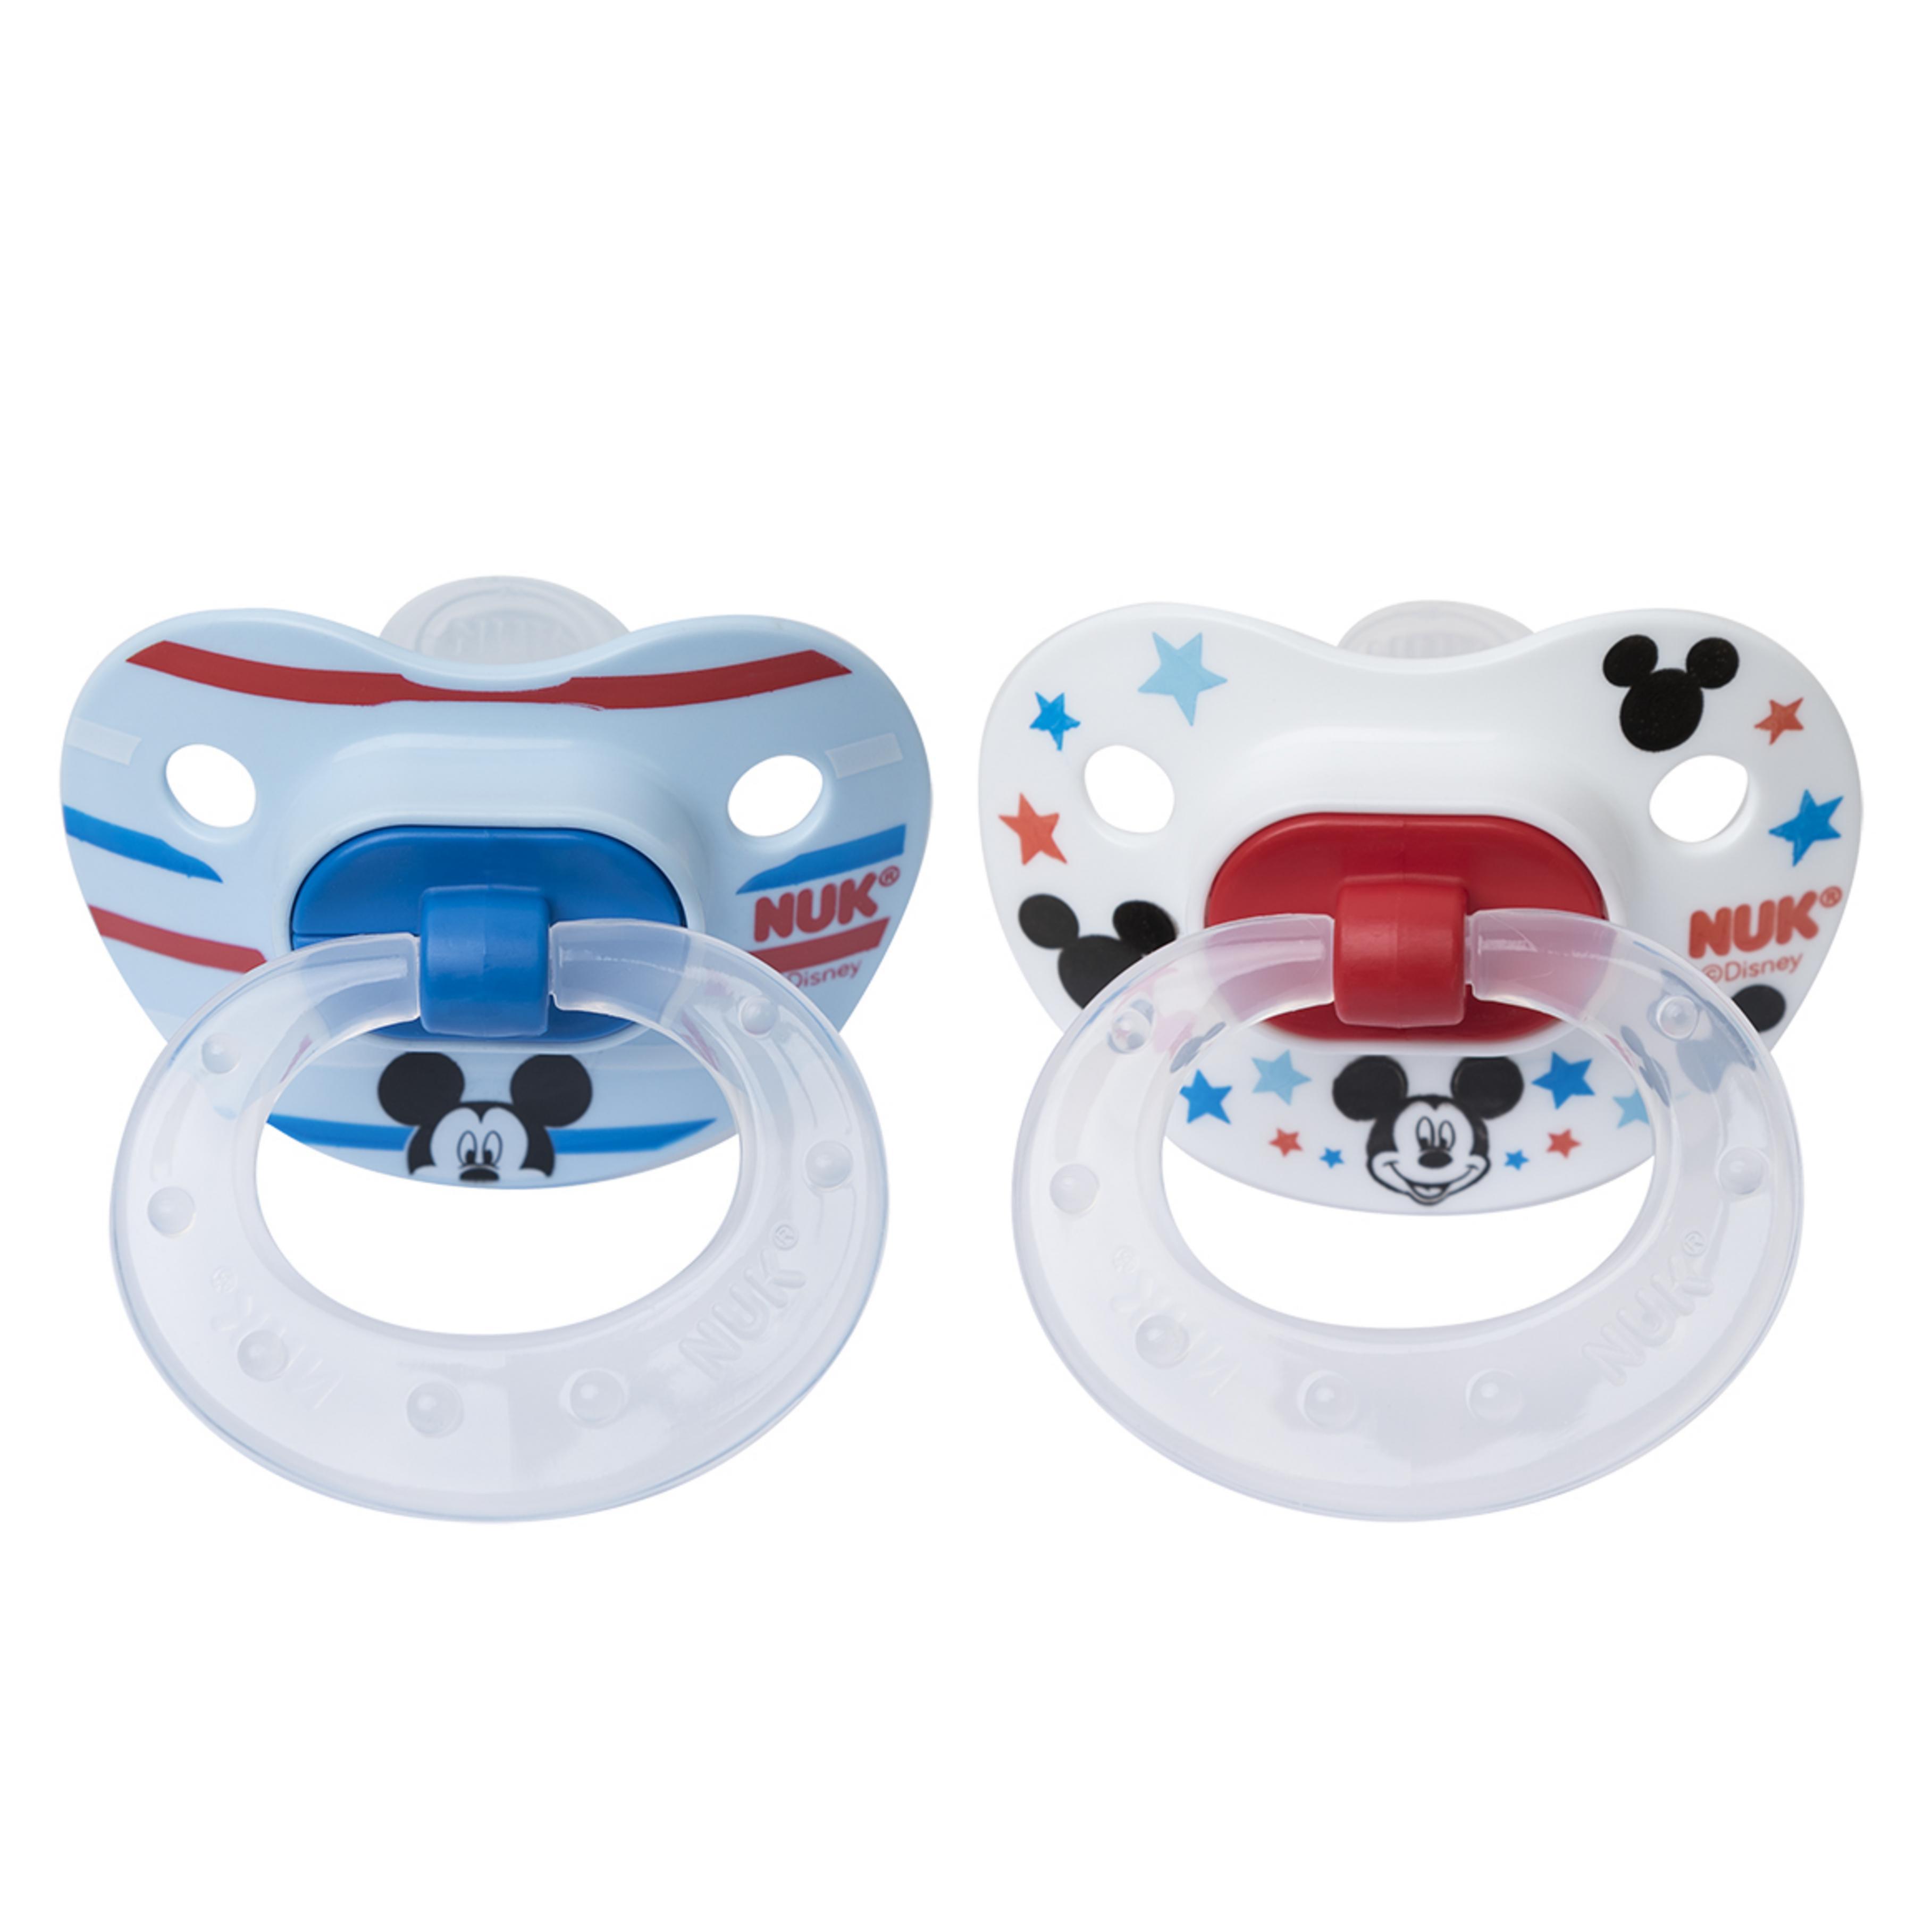 Nuk Disney Baby Orthodontic Pacifier 0-6m - 2 CT